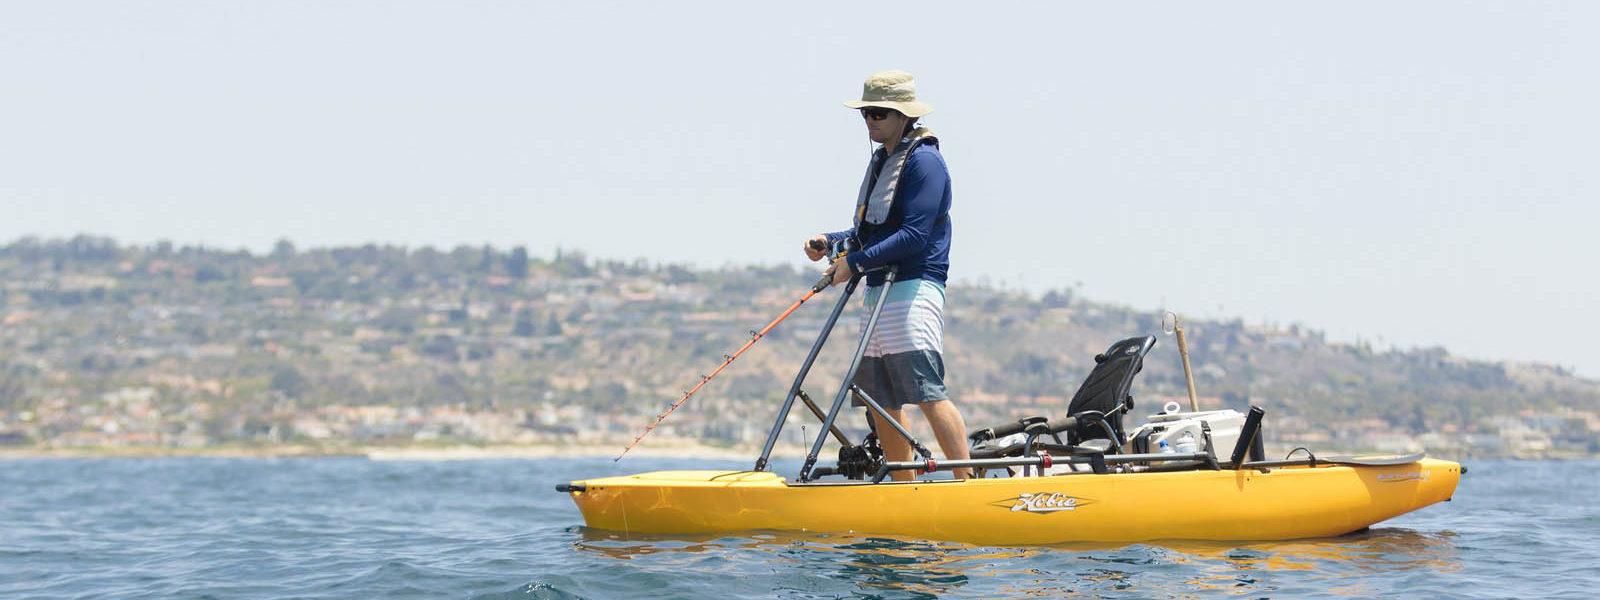 ProAngler12-action-fishing-hBar-Brendan-ocean-standing-lg_jpg_1600x1600__generated